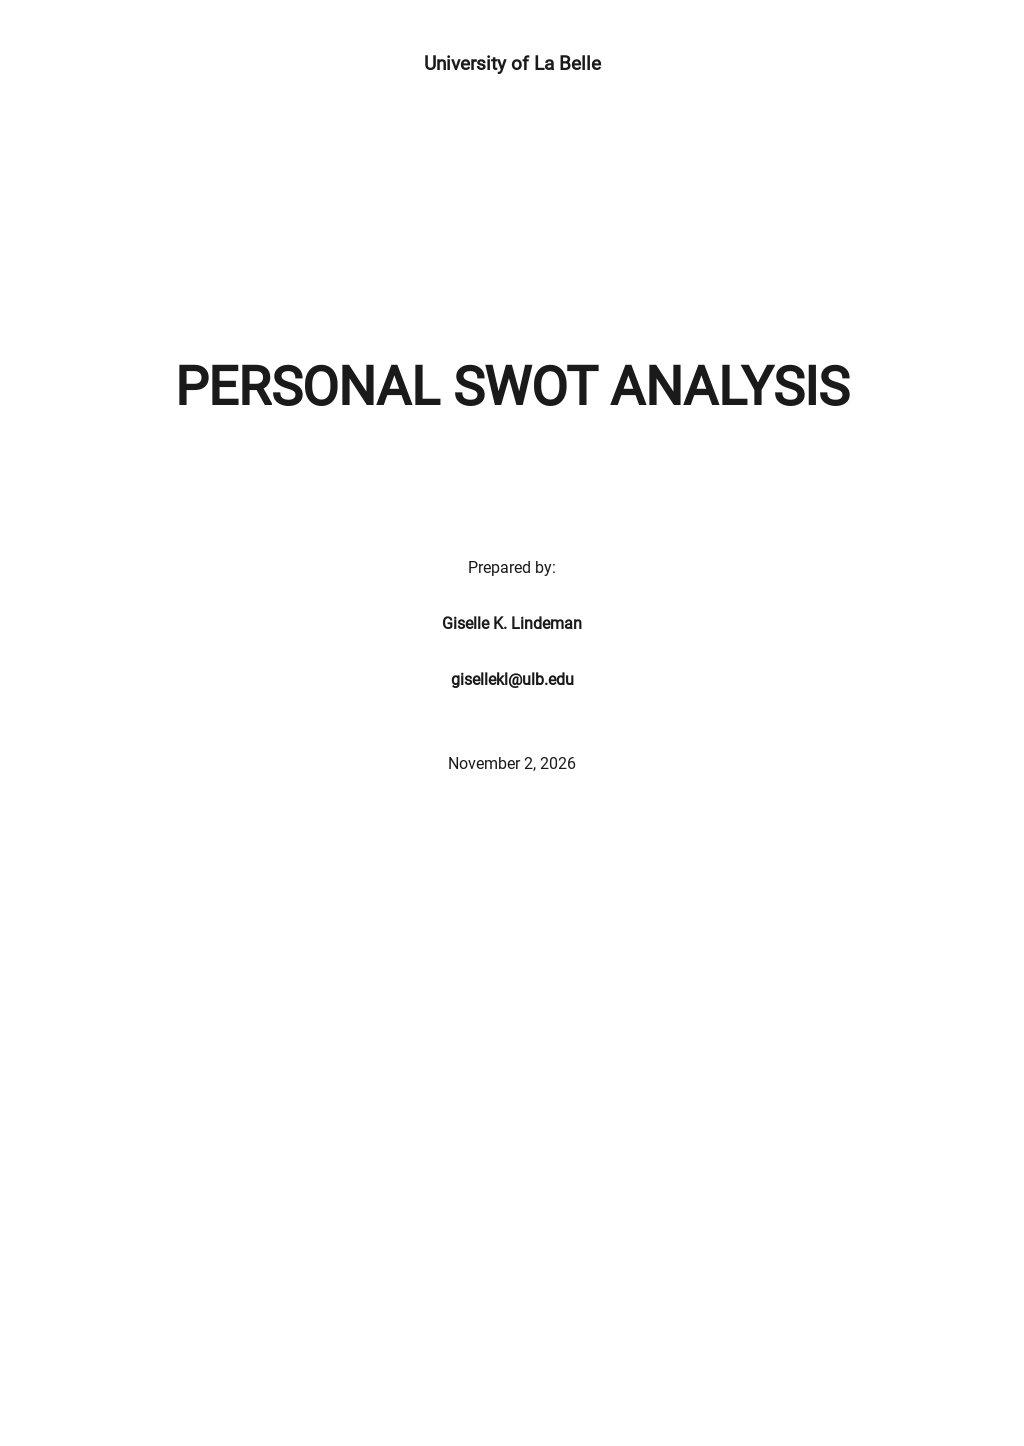 Personal Swot Analysis Template.jpe